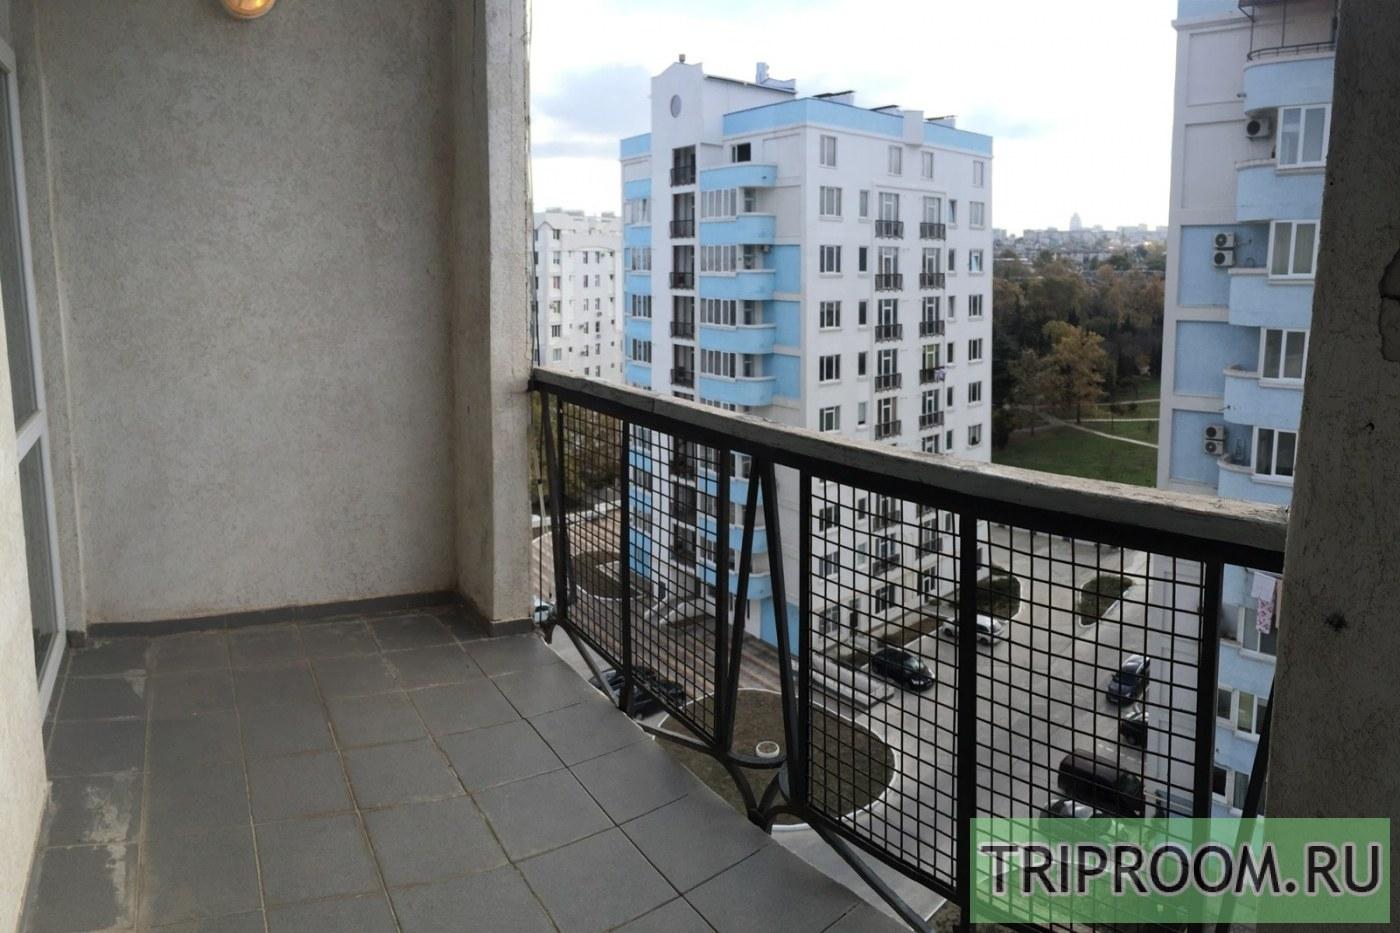 2-комнатная квартира посуточно (вариант № 657), ул. Дыбенко улица, фото № 14